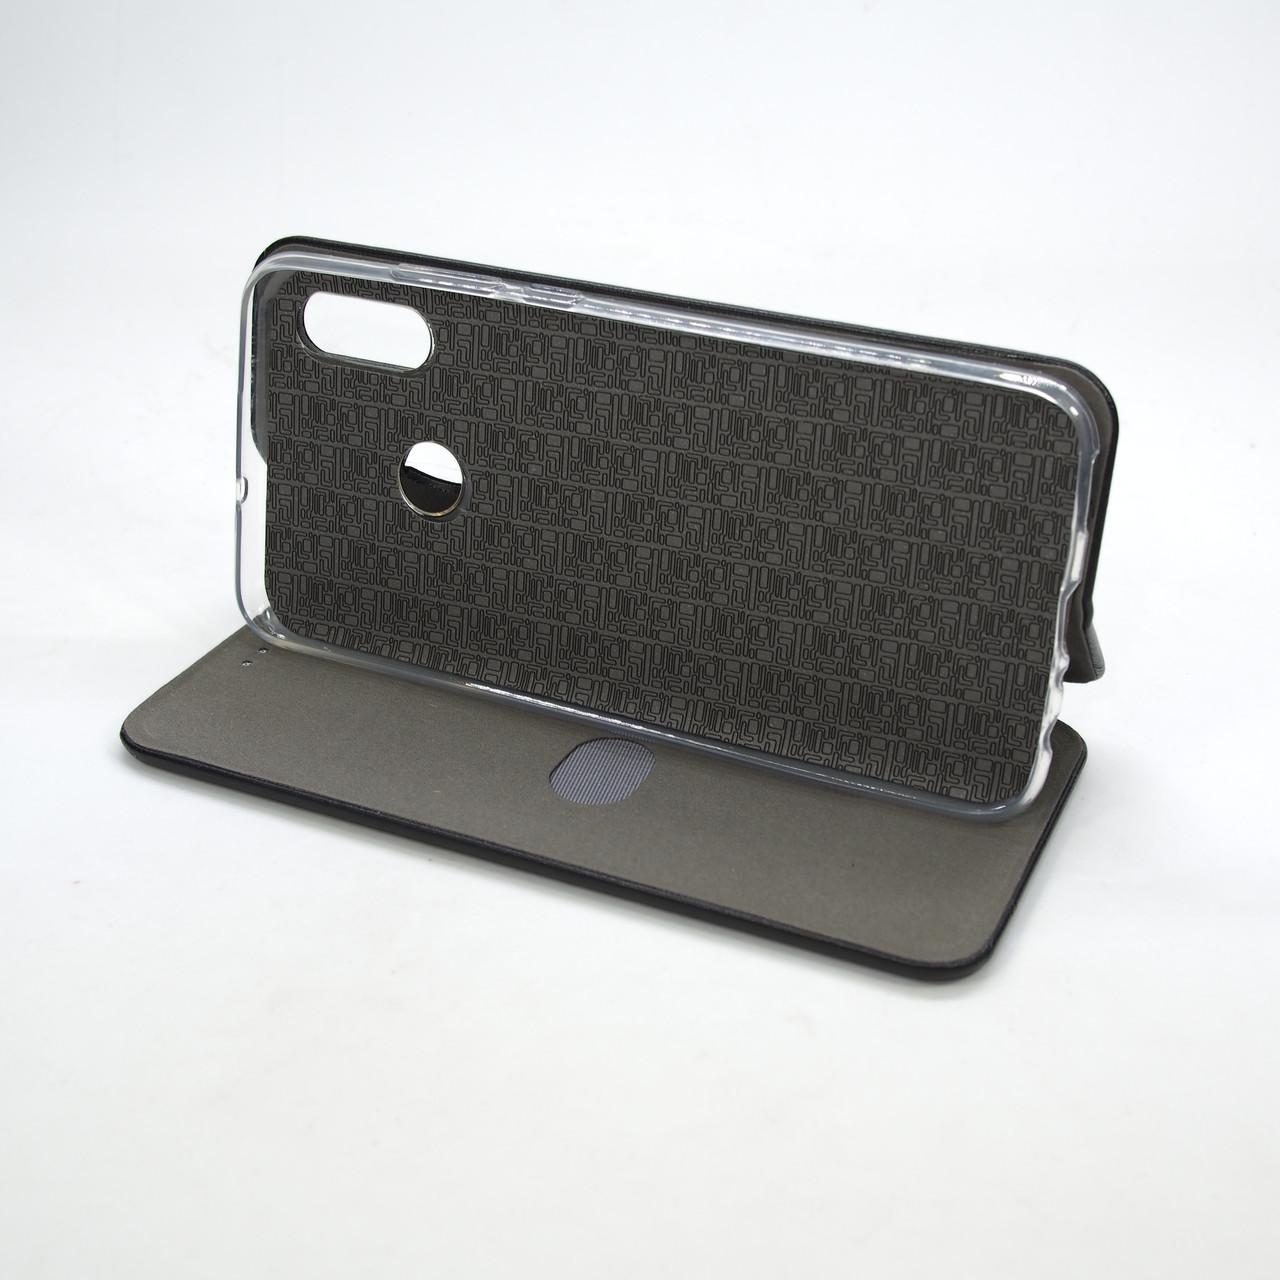 Book Cover Leather Huawei P Smart 2019 black Для телефона